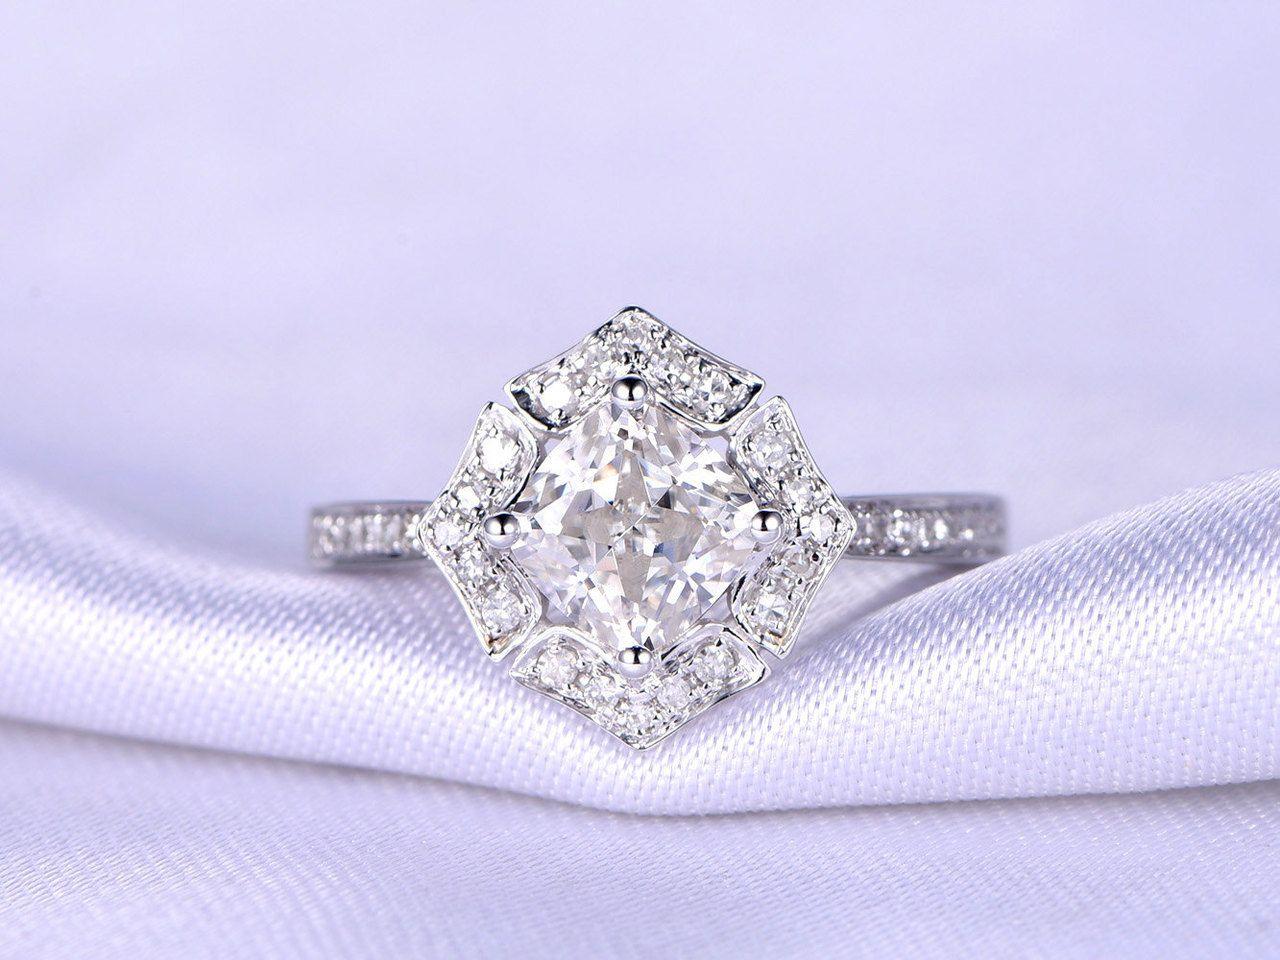 Ct moissanite engagement ringmm cushion cut glaring